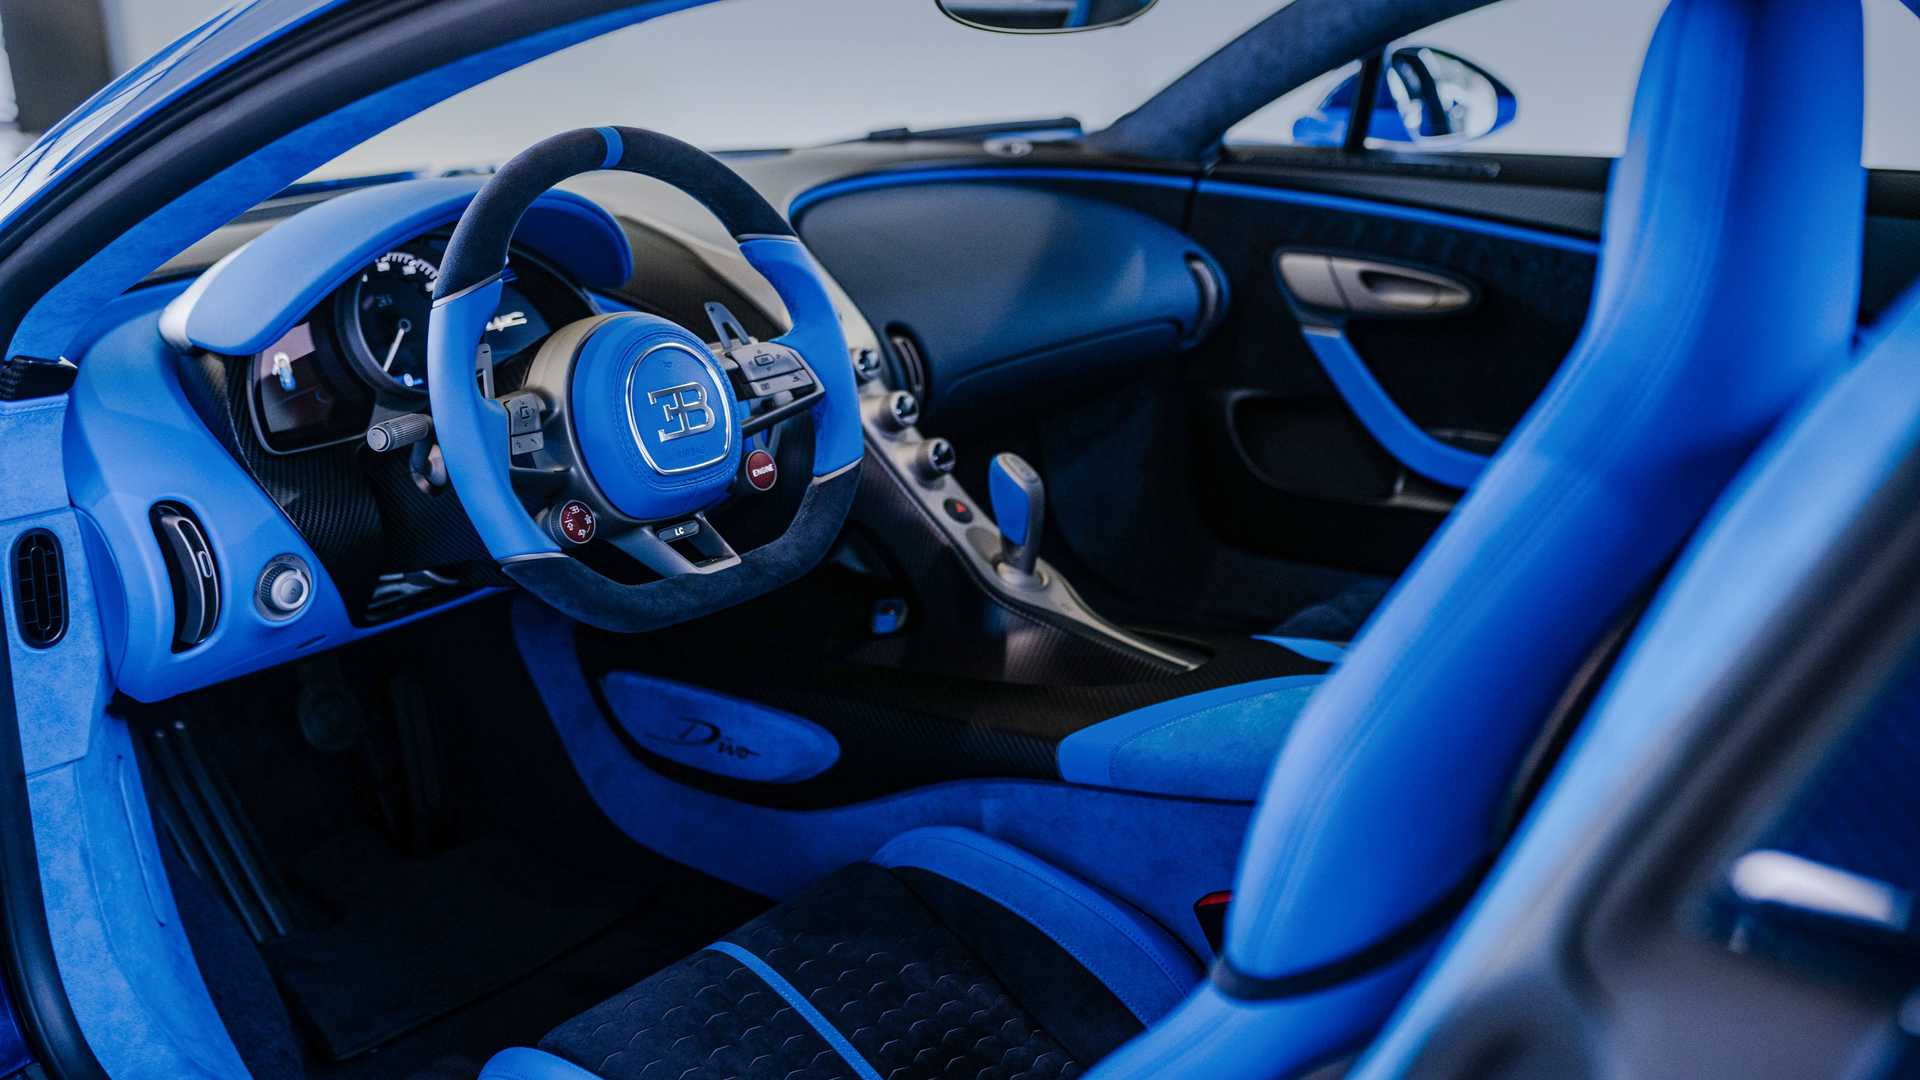 https://cdn.motor1.com/images/mgl/we46E/s6/bugatti-divo-interior-view.jpg